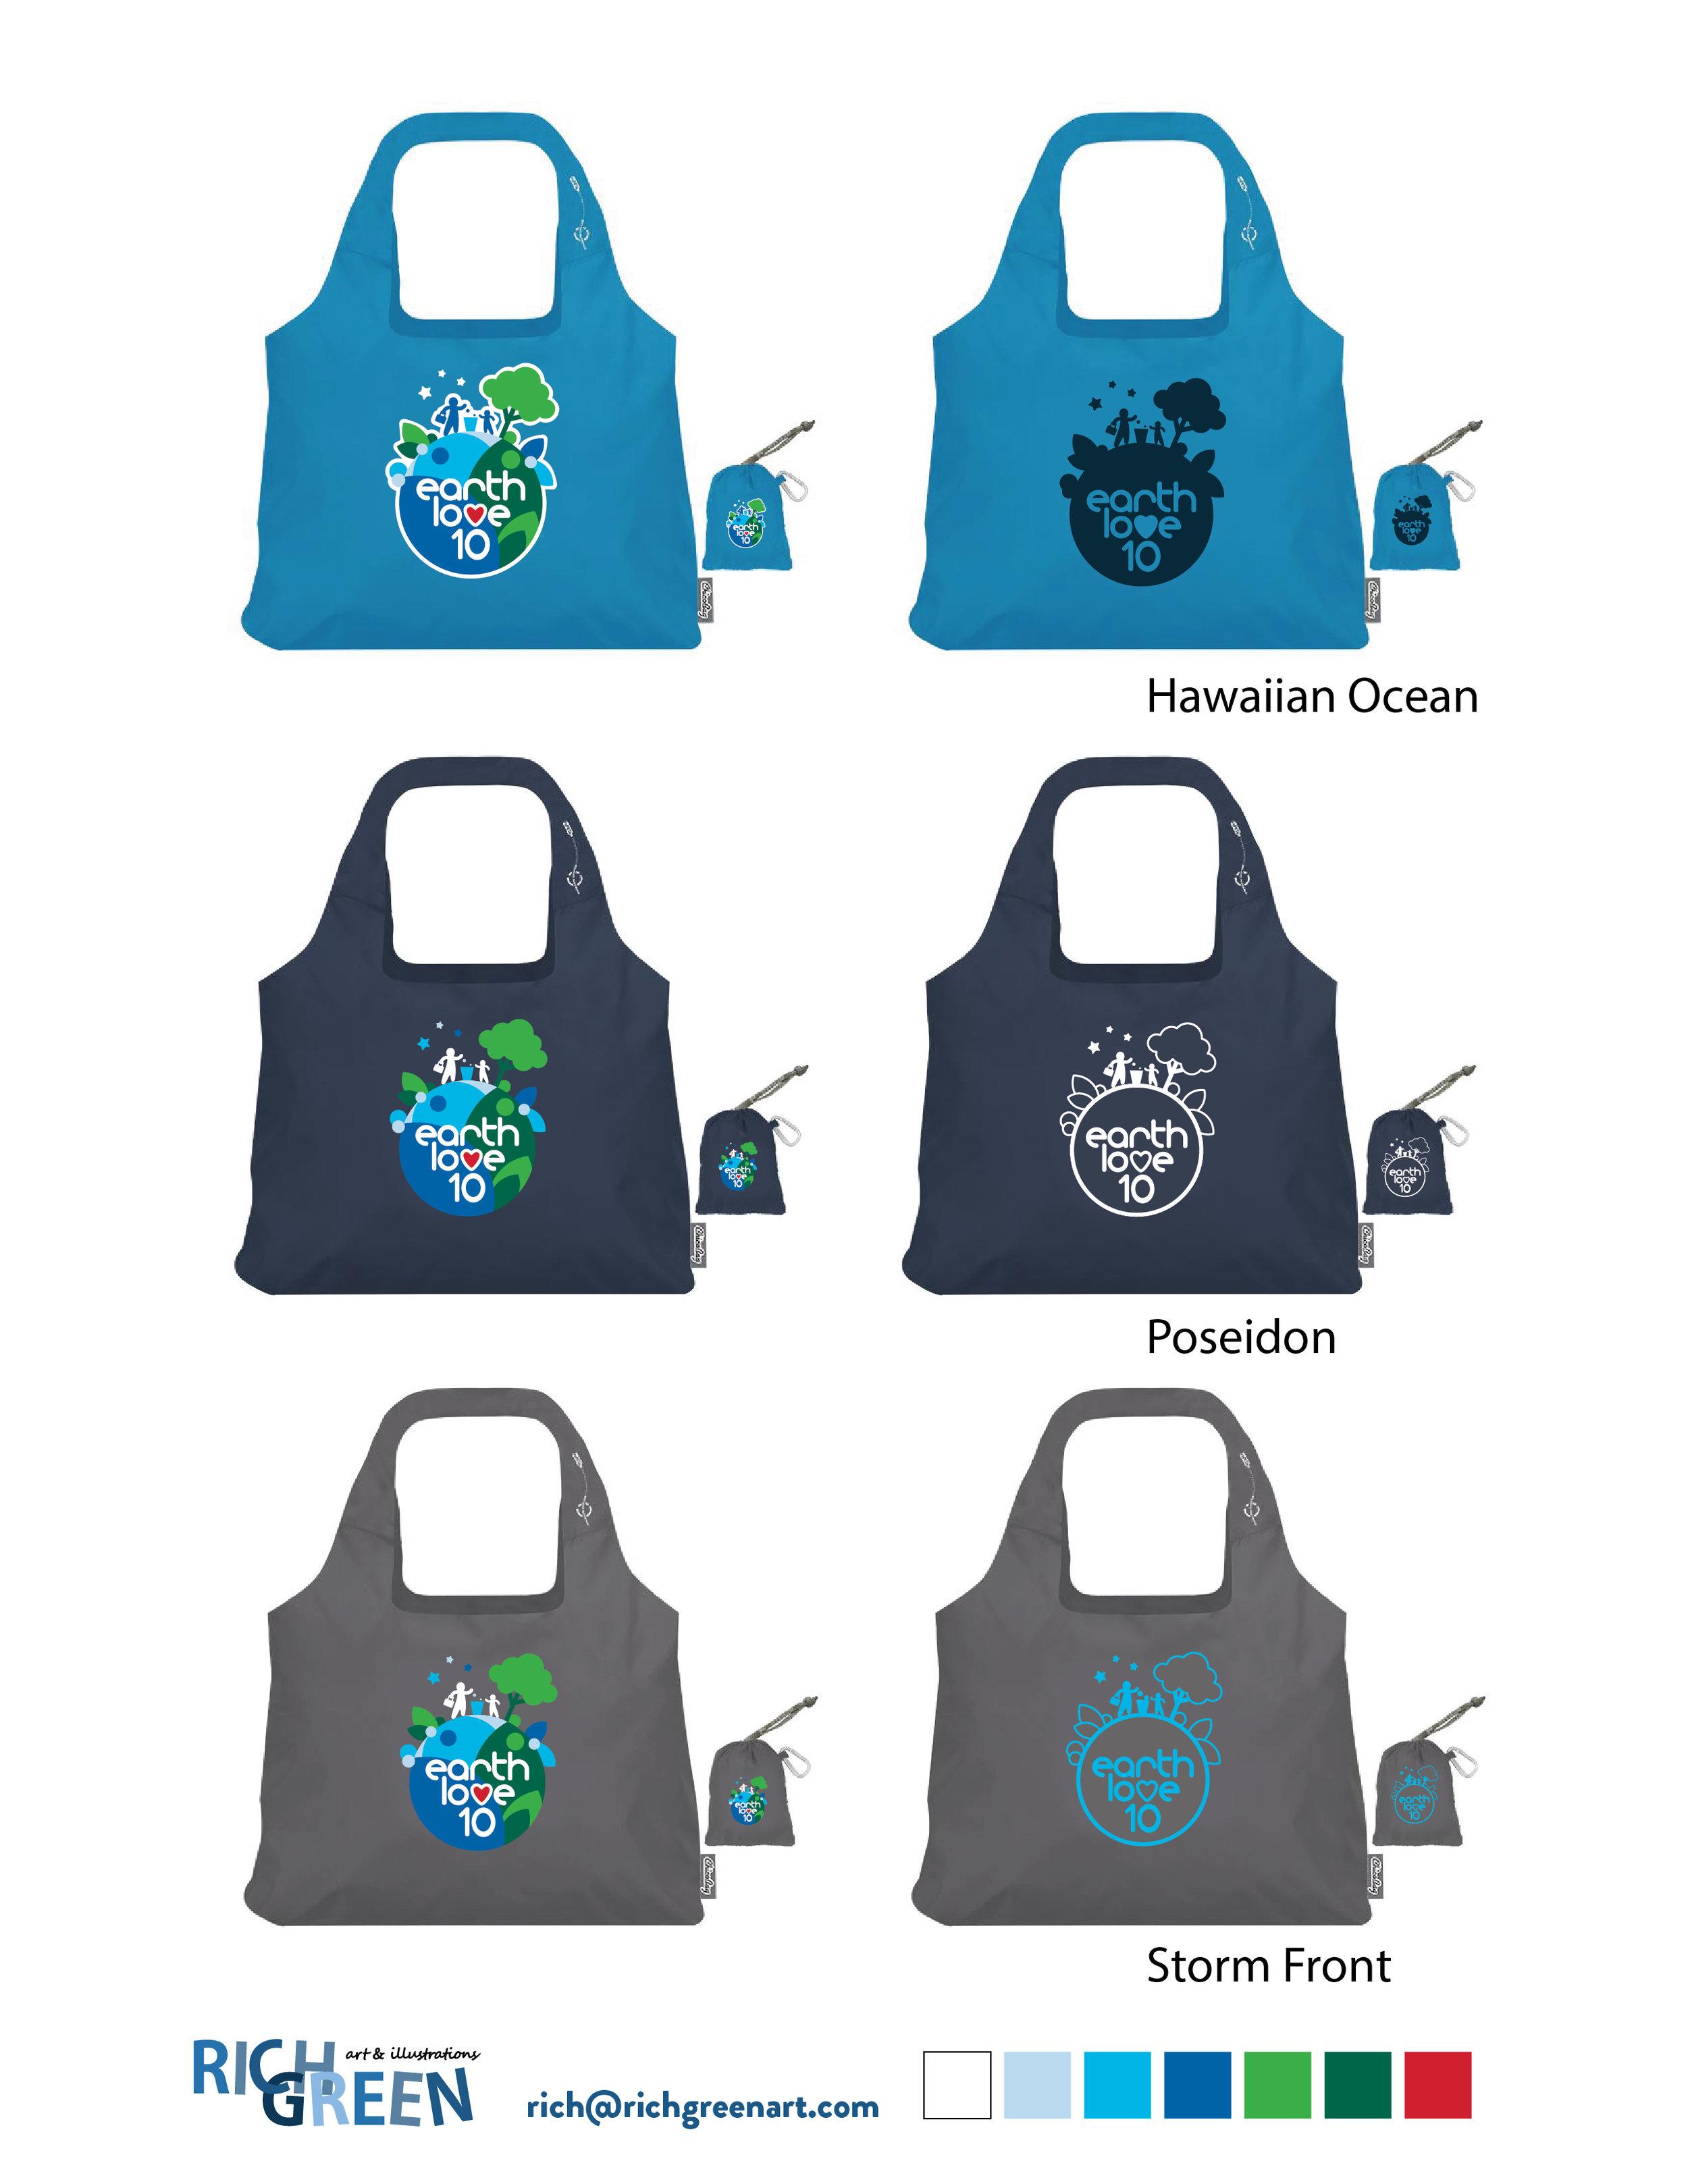 Earth Love 10 product mock ups 01_Bag Mockups.jpg